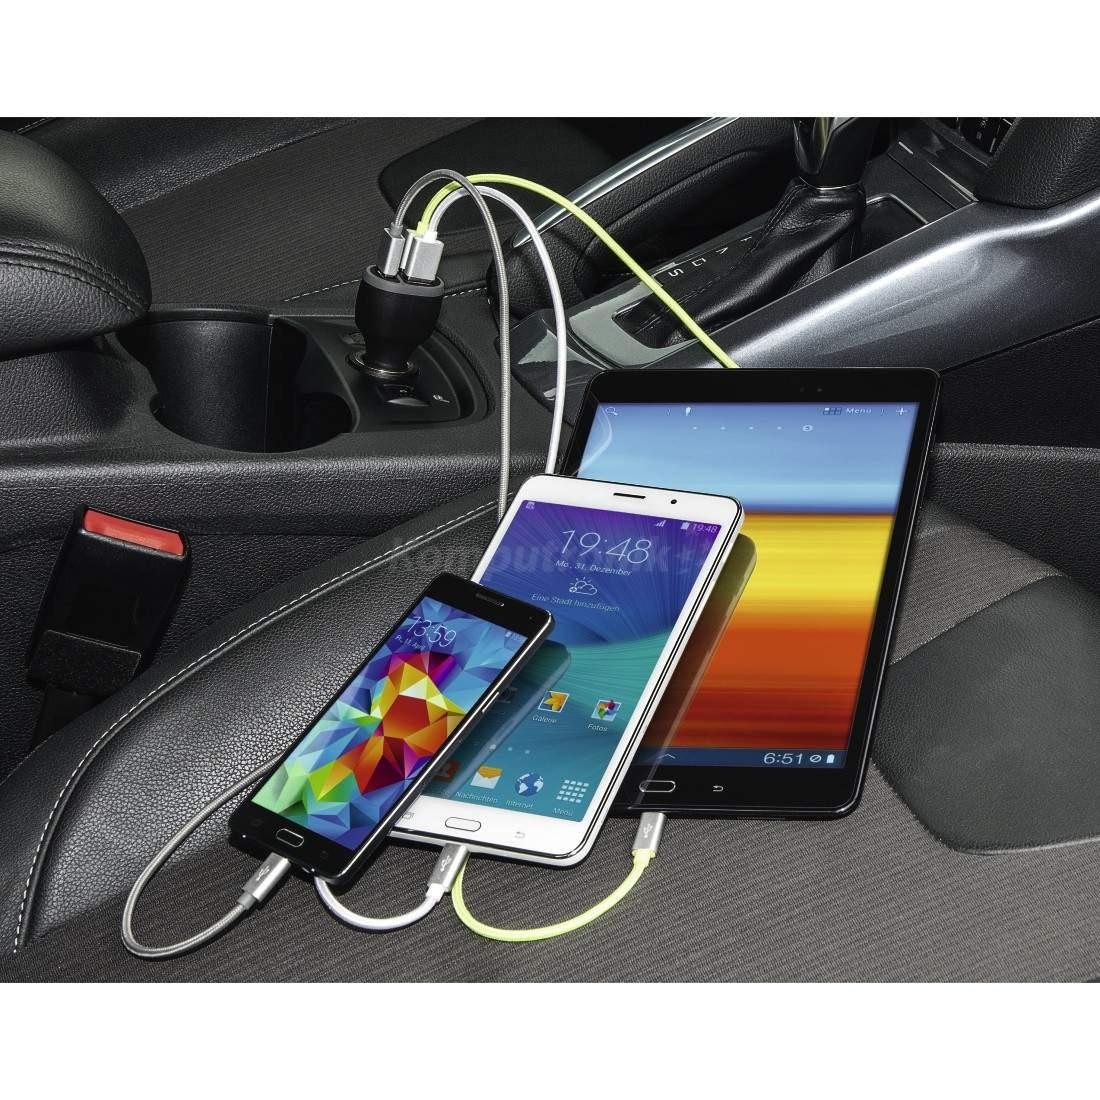 Hama Car Charger 3x USB 5.2A